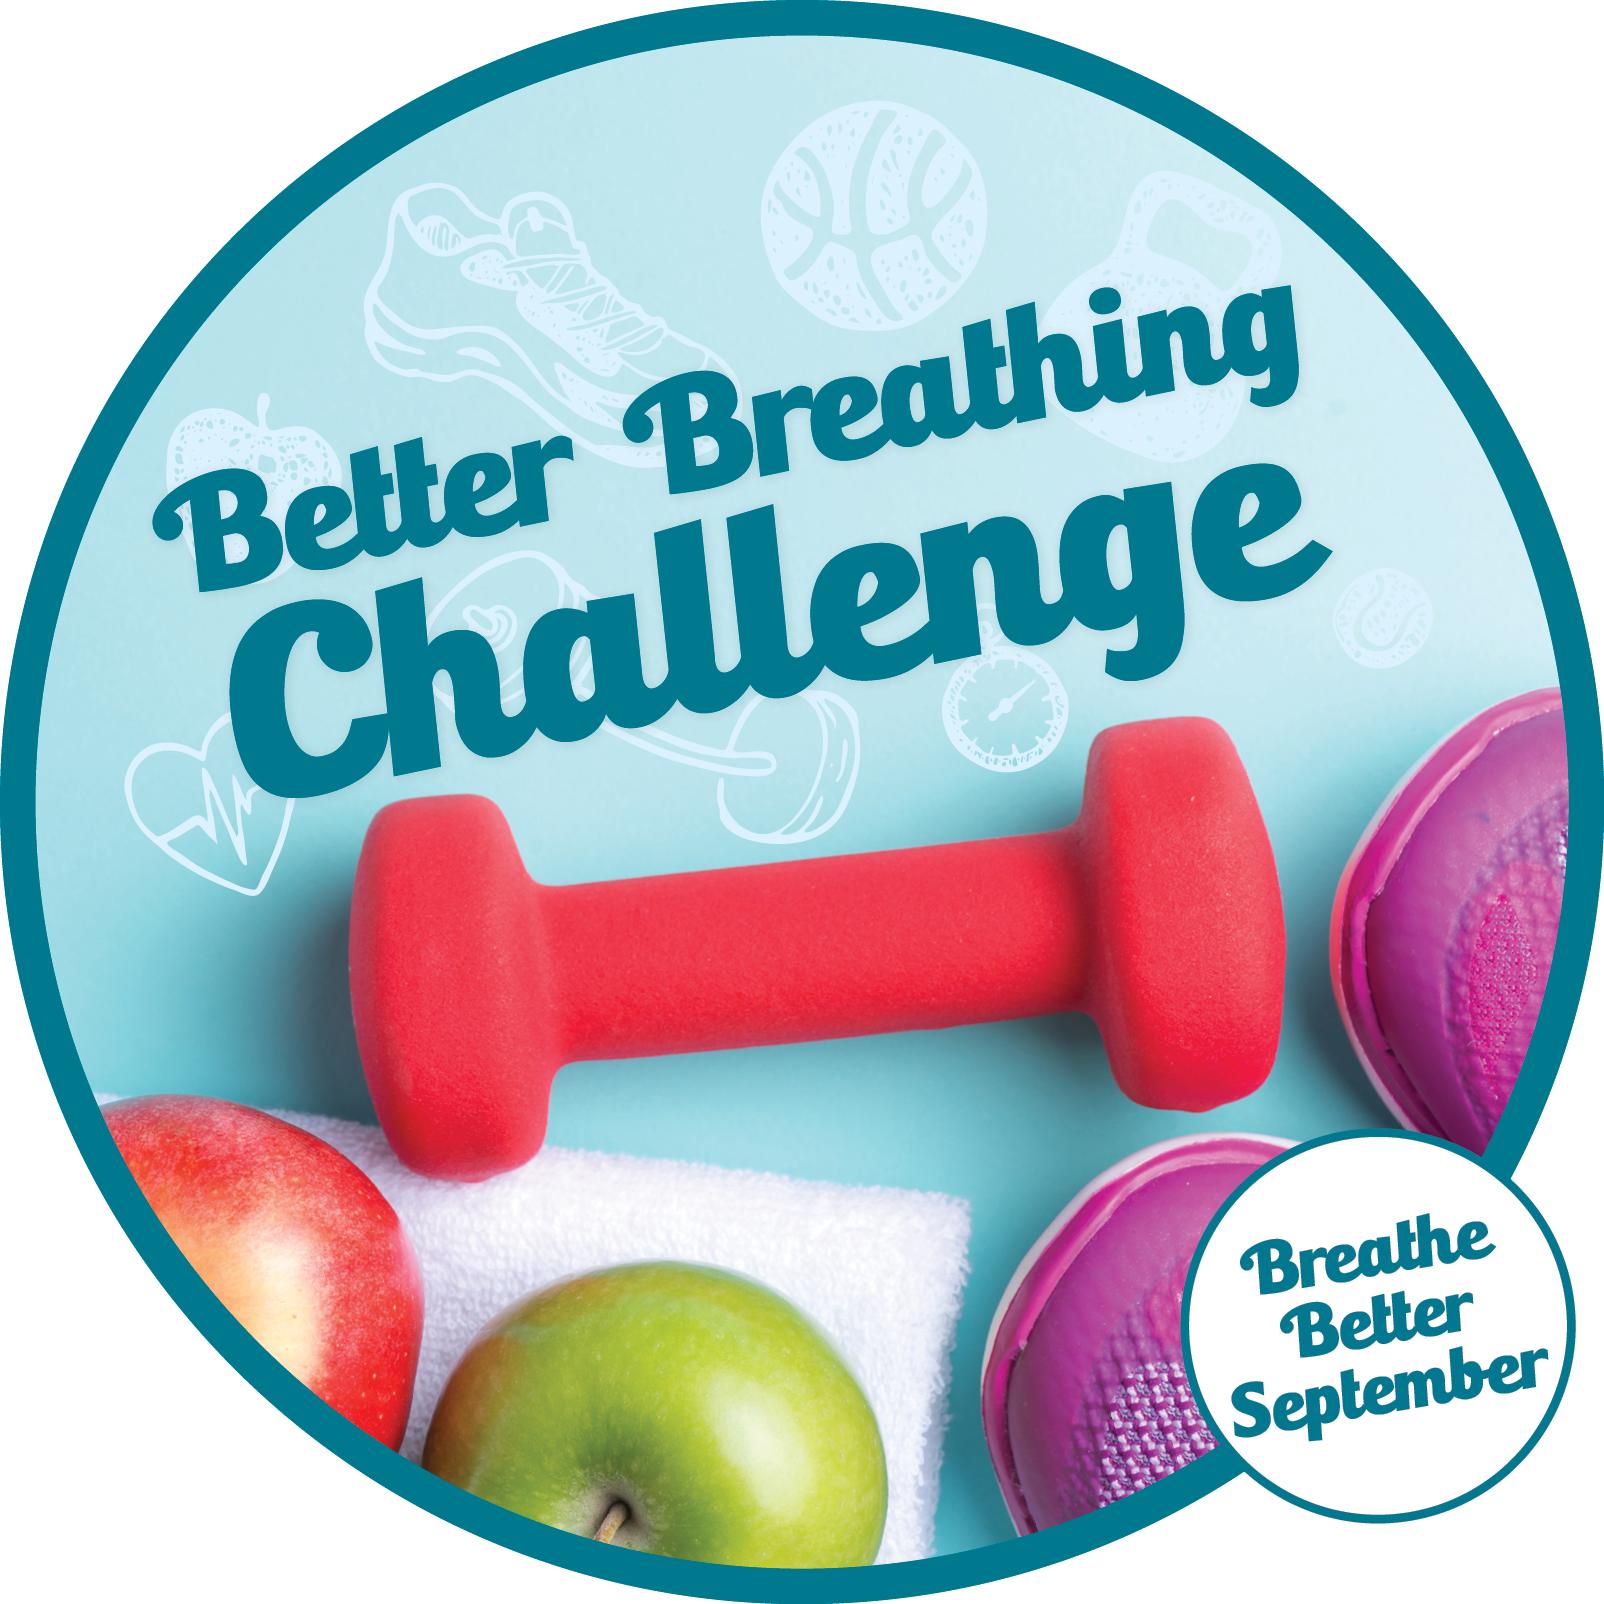 BBS-Better-Breathing-Challenge-w-BBS-logo.png#asset:3314